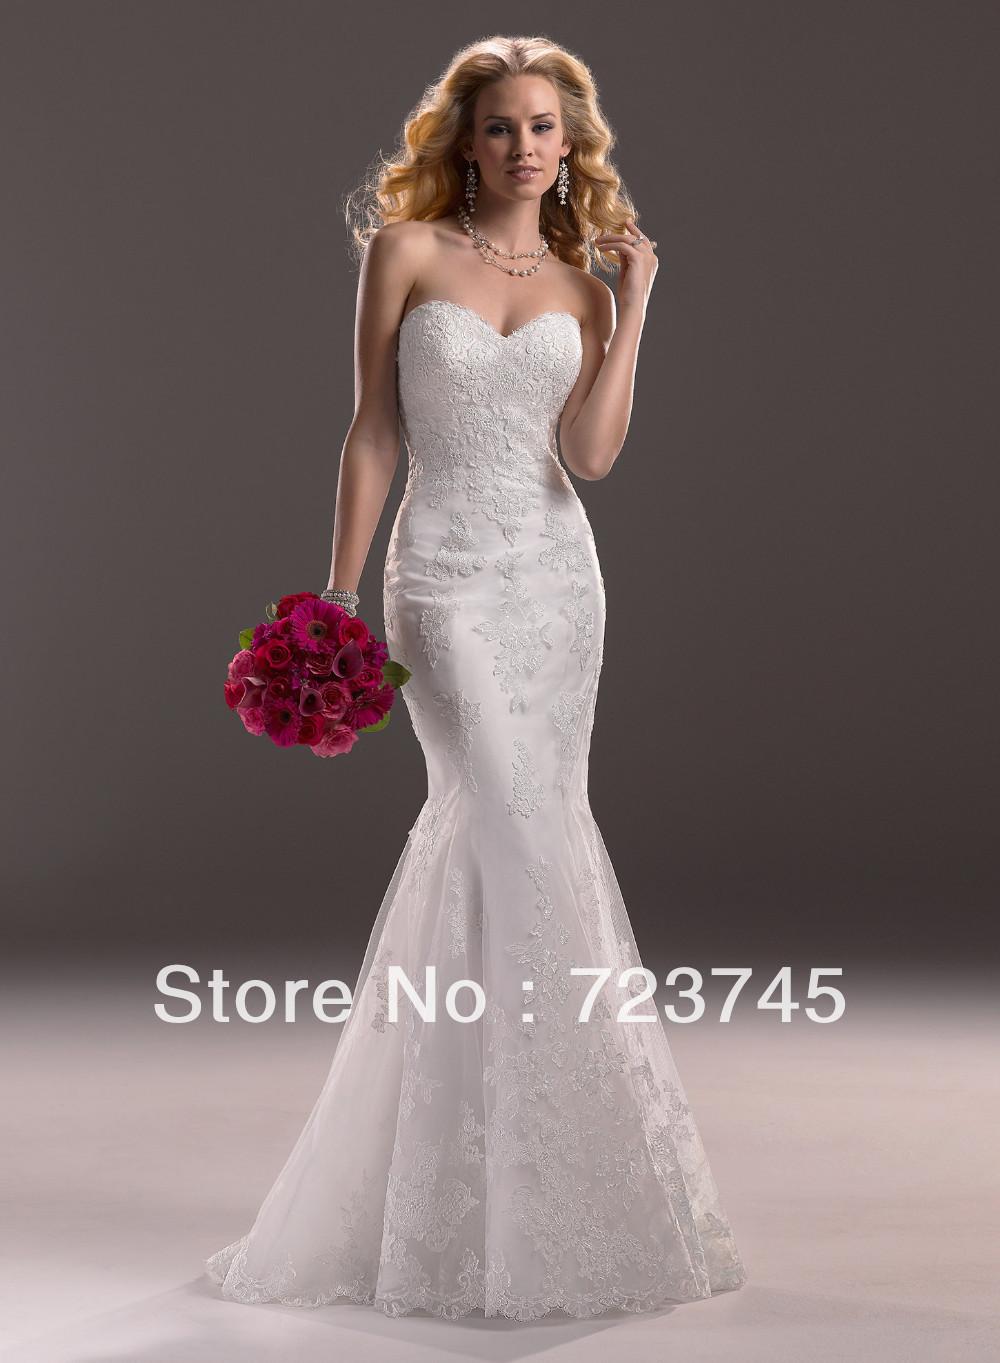 free shipping designer bridesmaid dresses